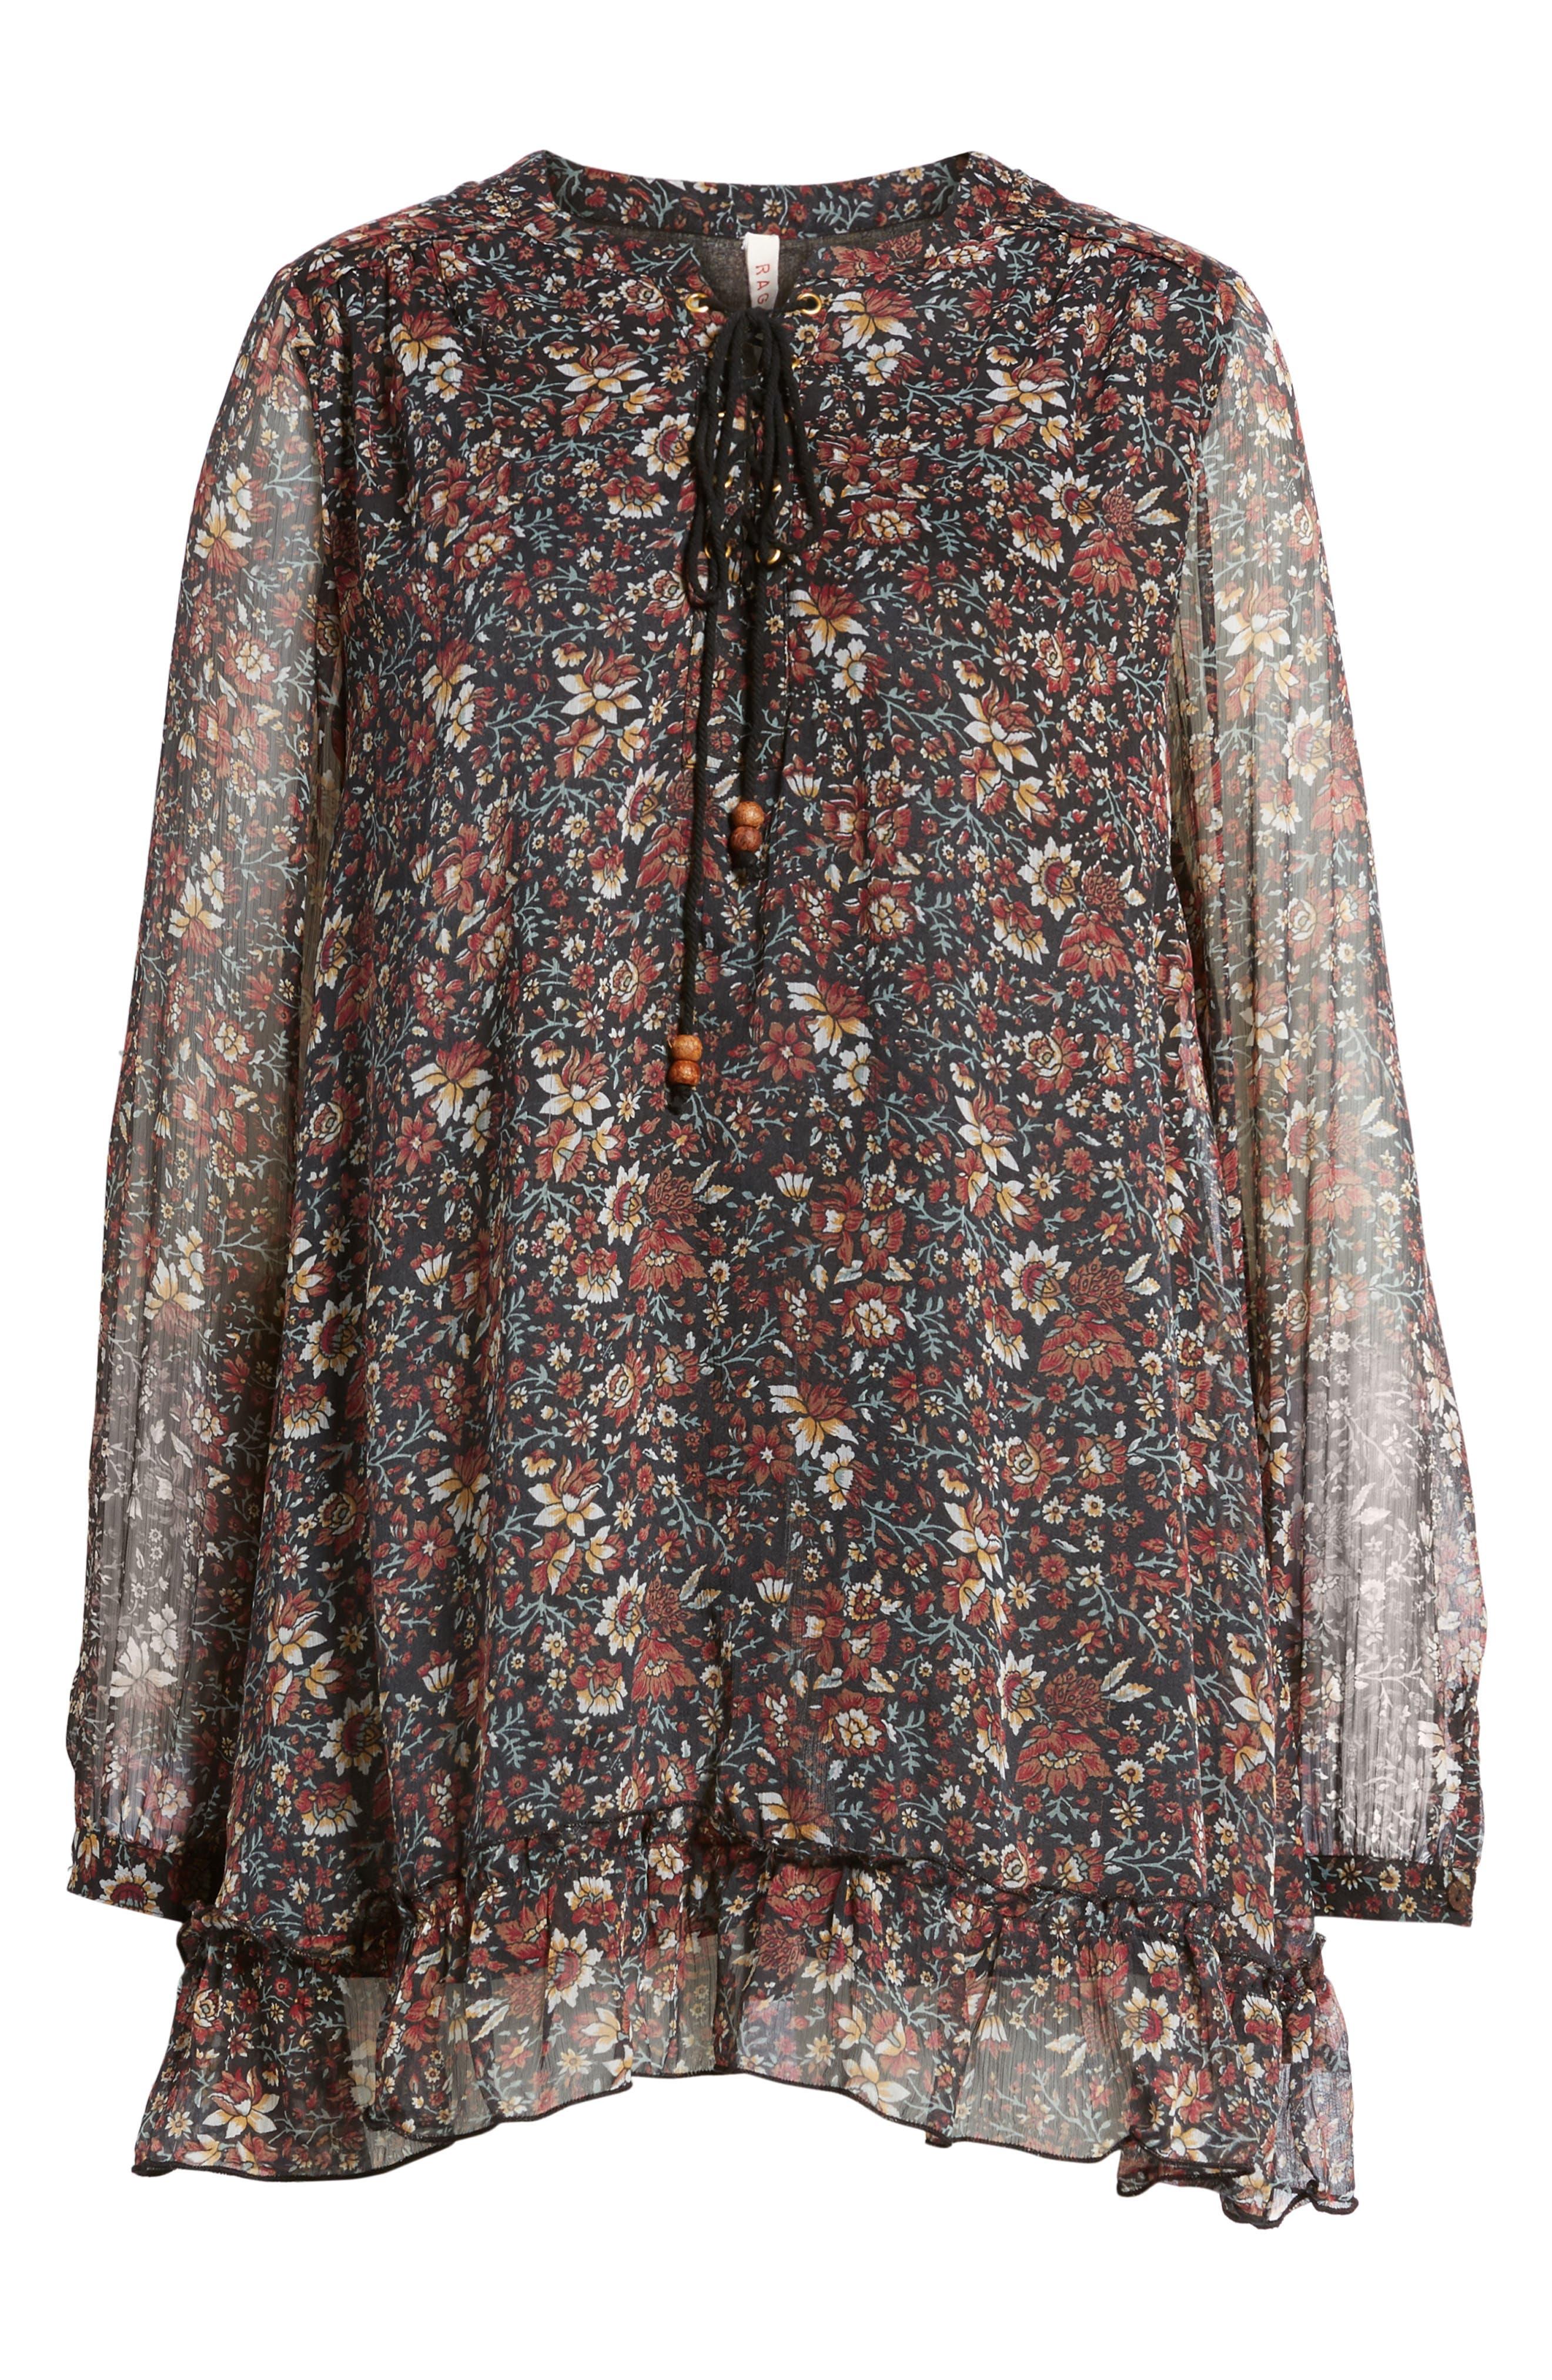 Eloise Floral Print Minidress,                             Alternate thumbnail 6, color,                             001